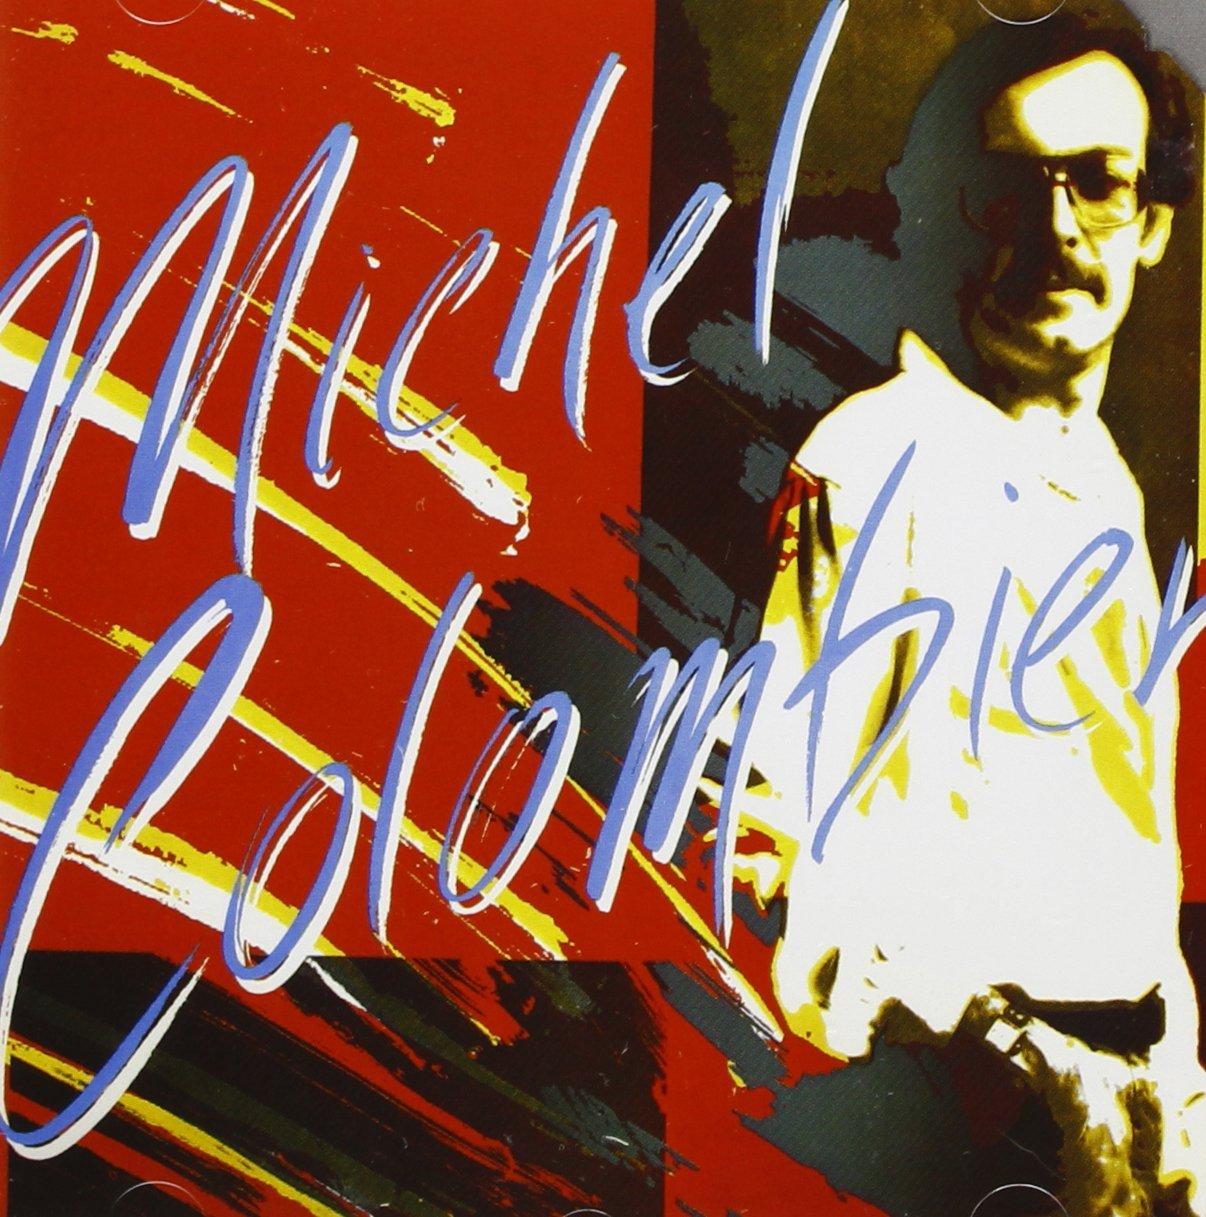 1979 Michel Colombier – Michel Colombier